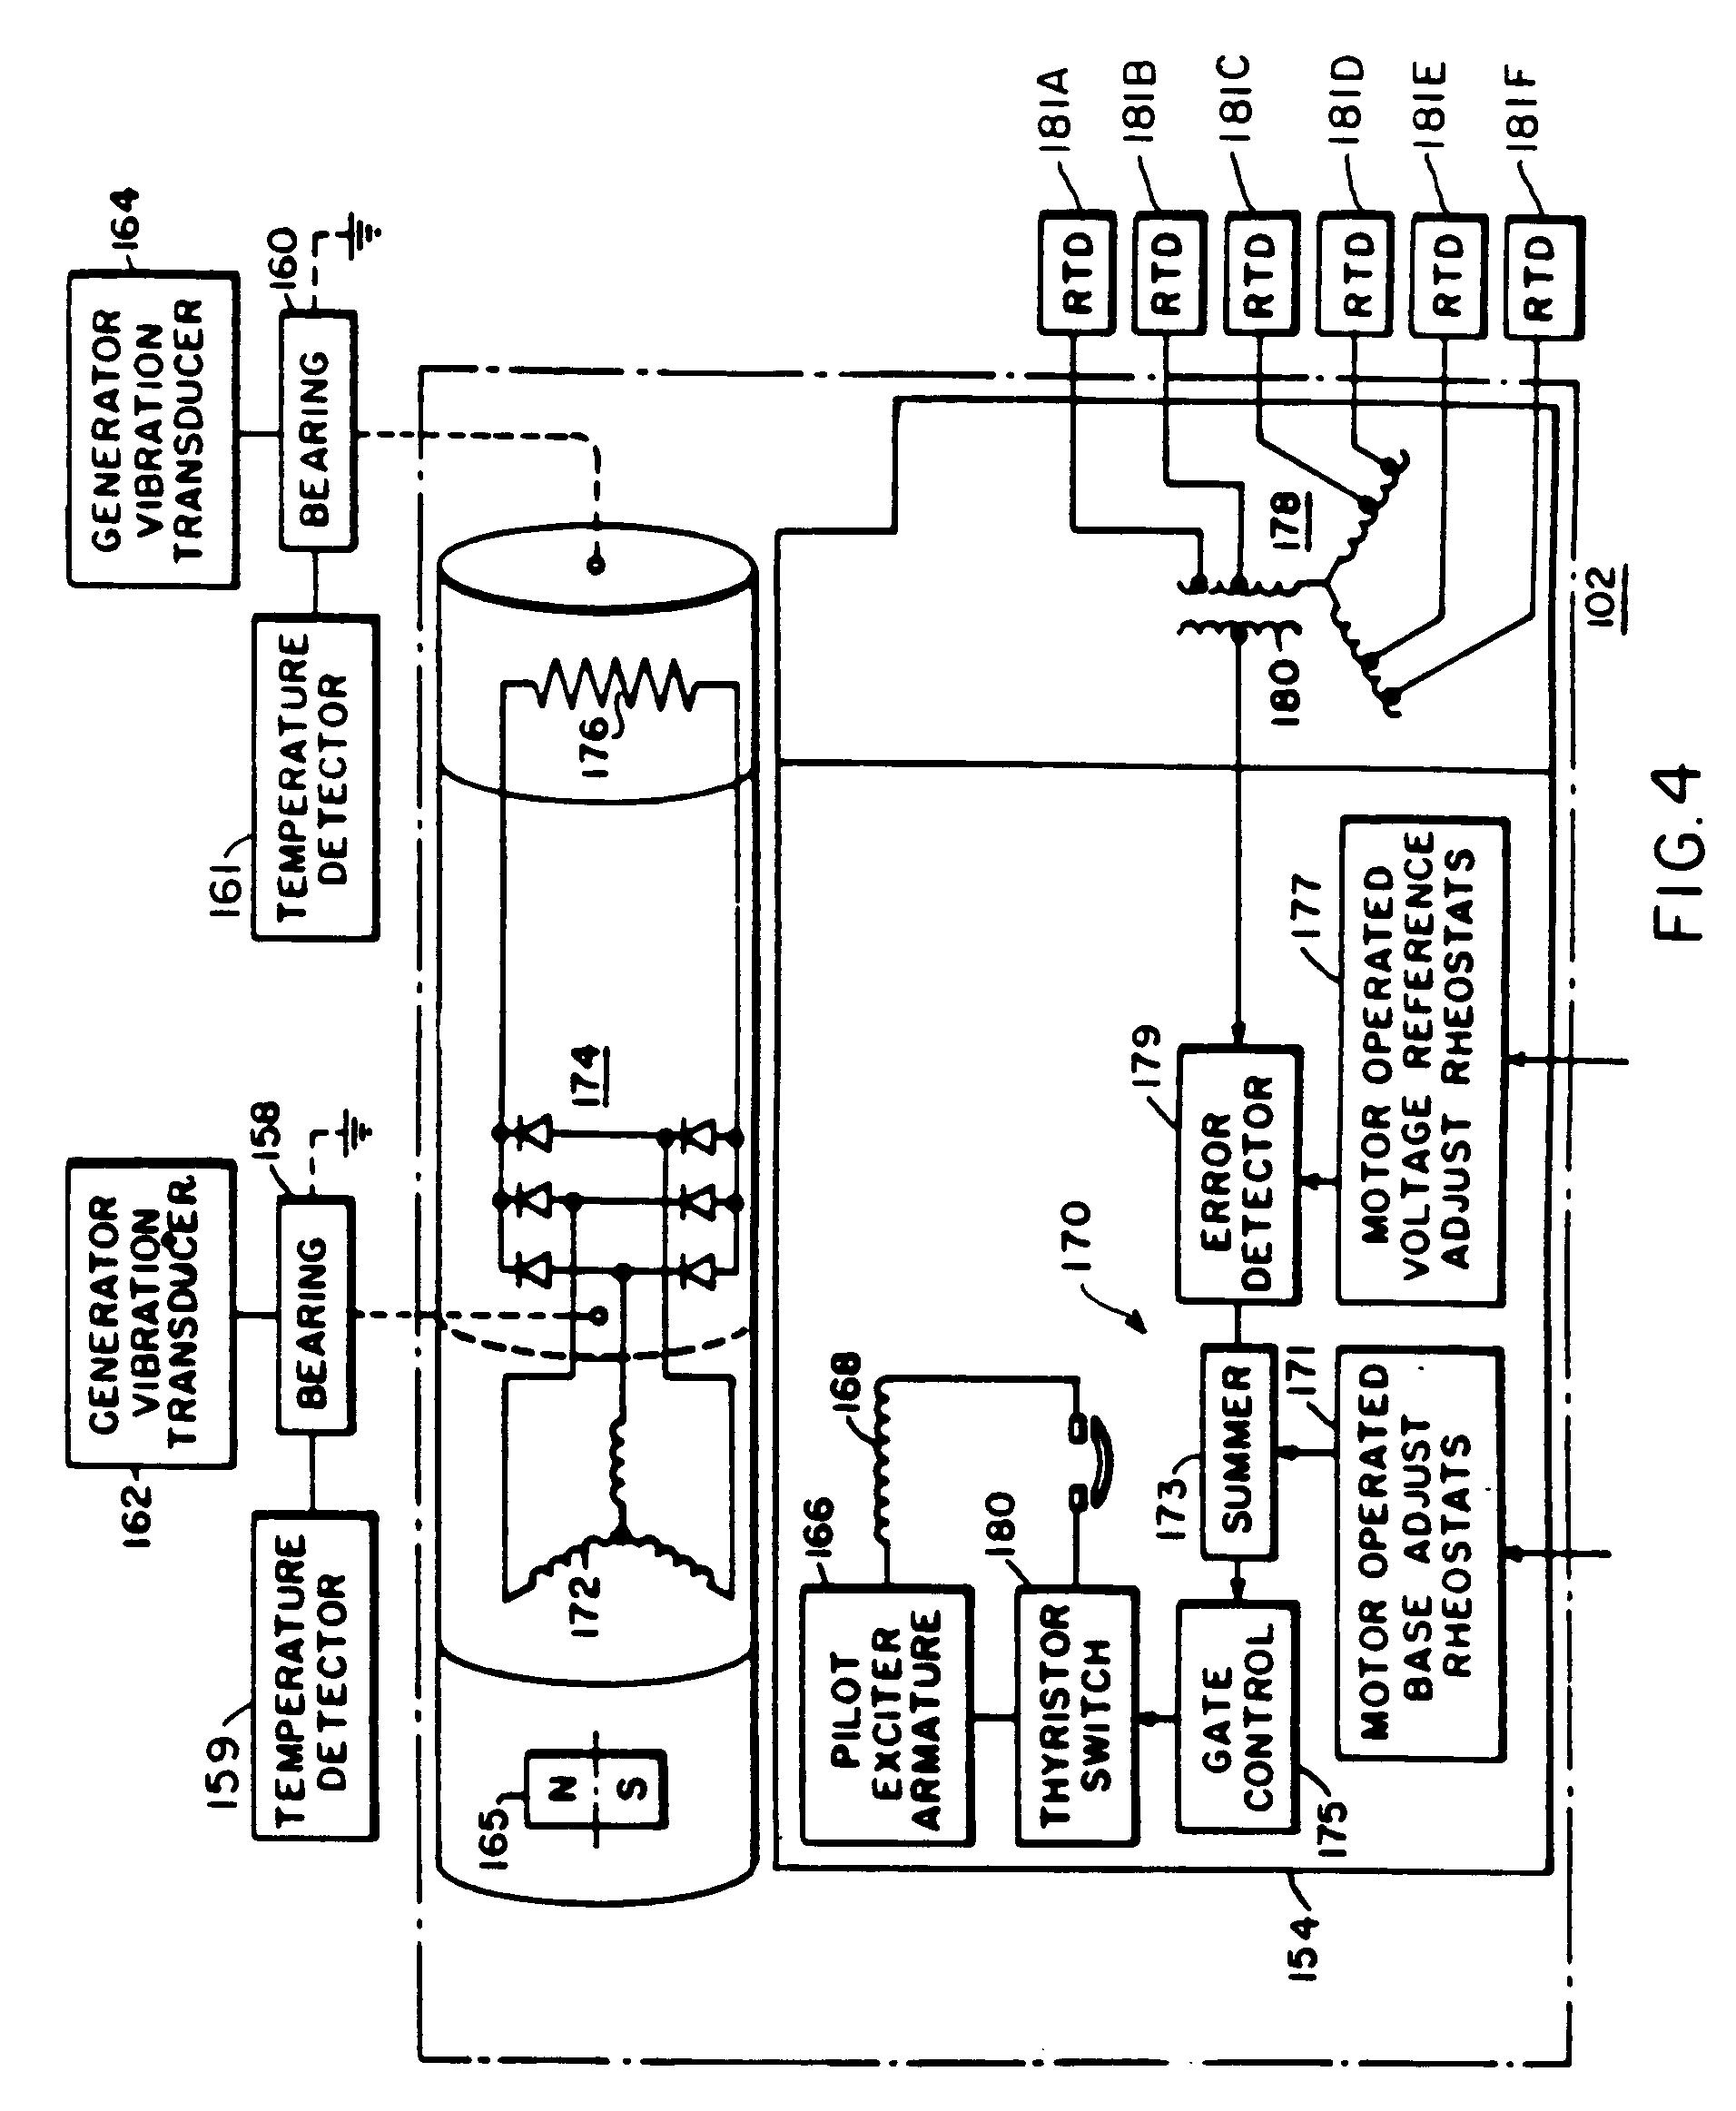 patent ep0432570b1